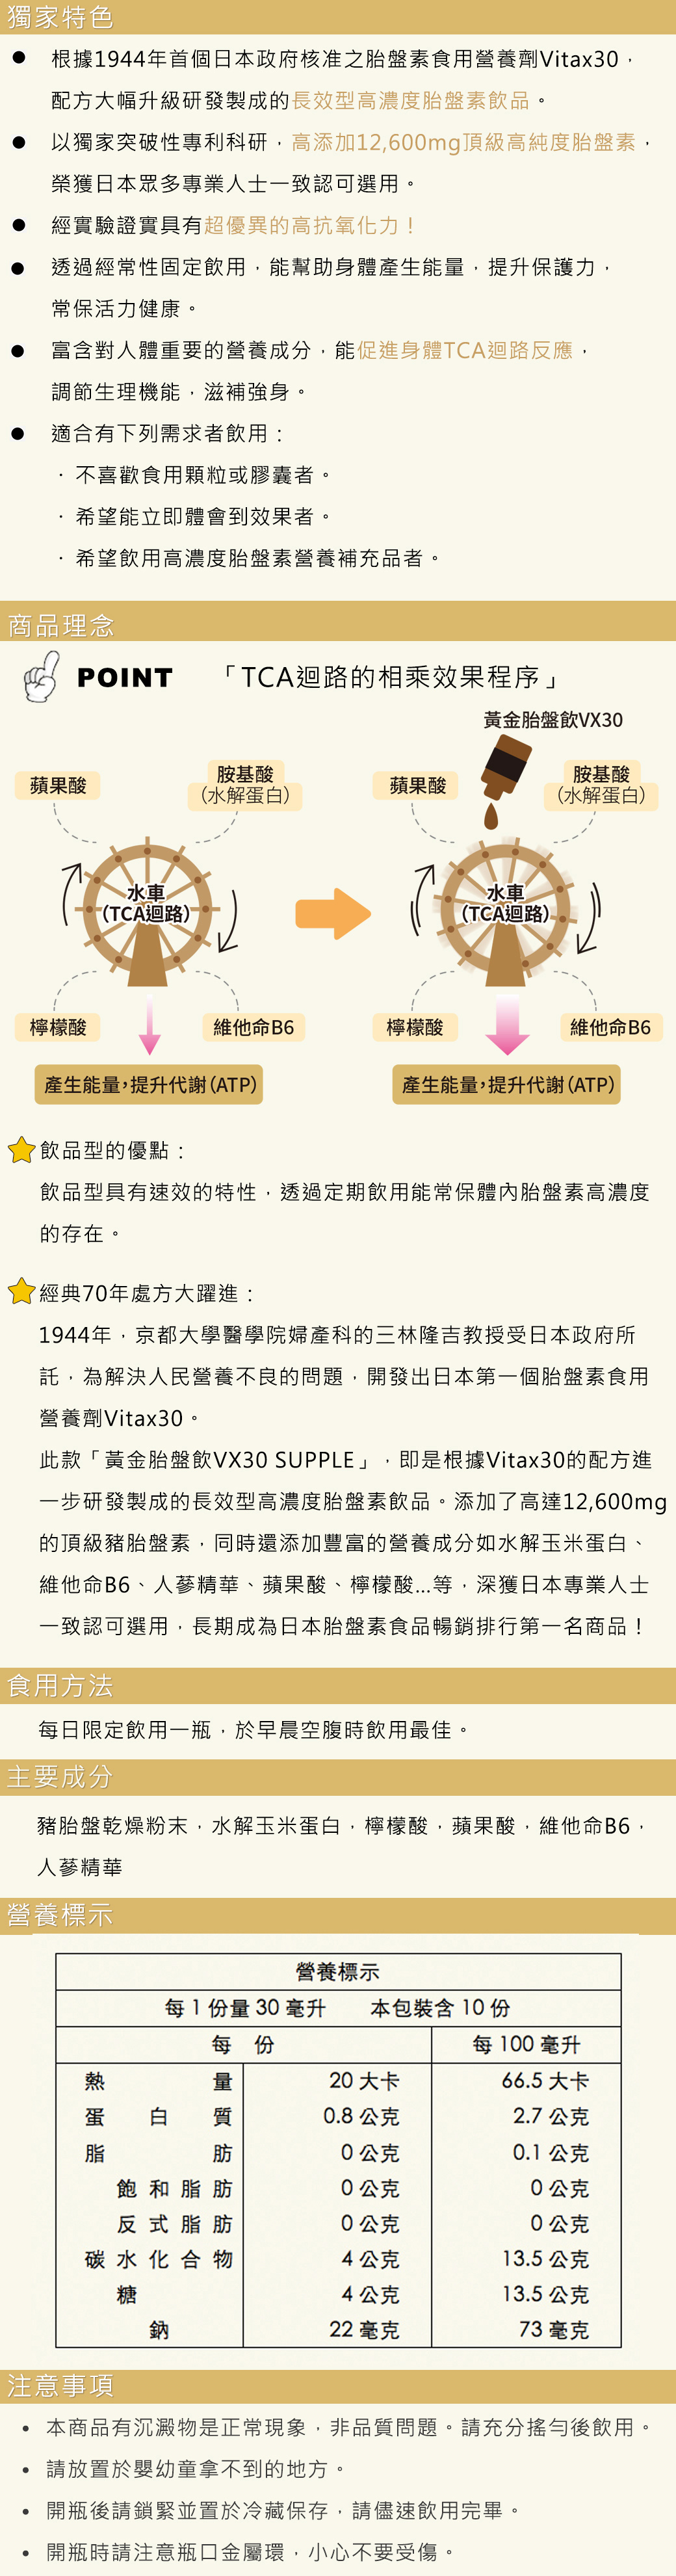 DM-VX30_修改版0206